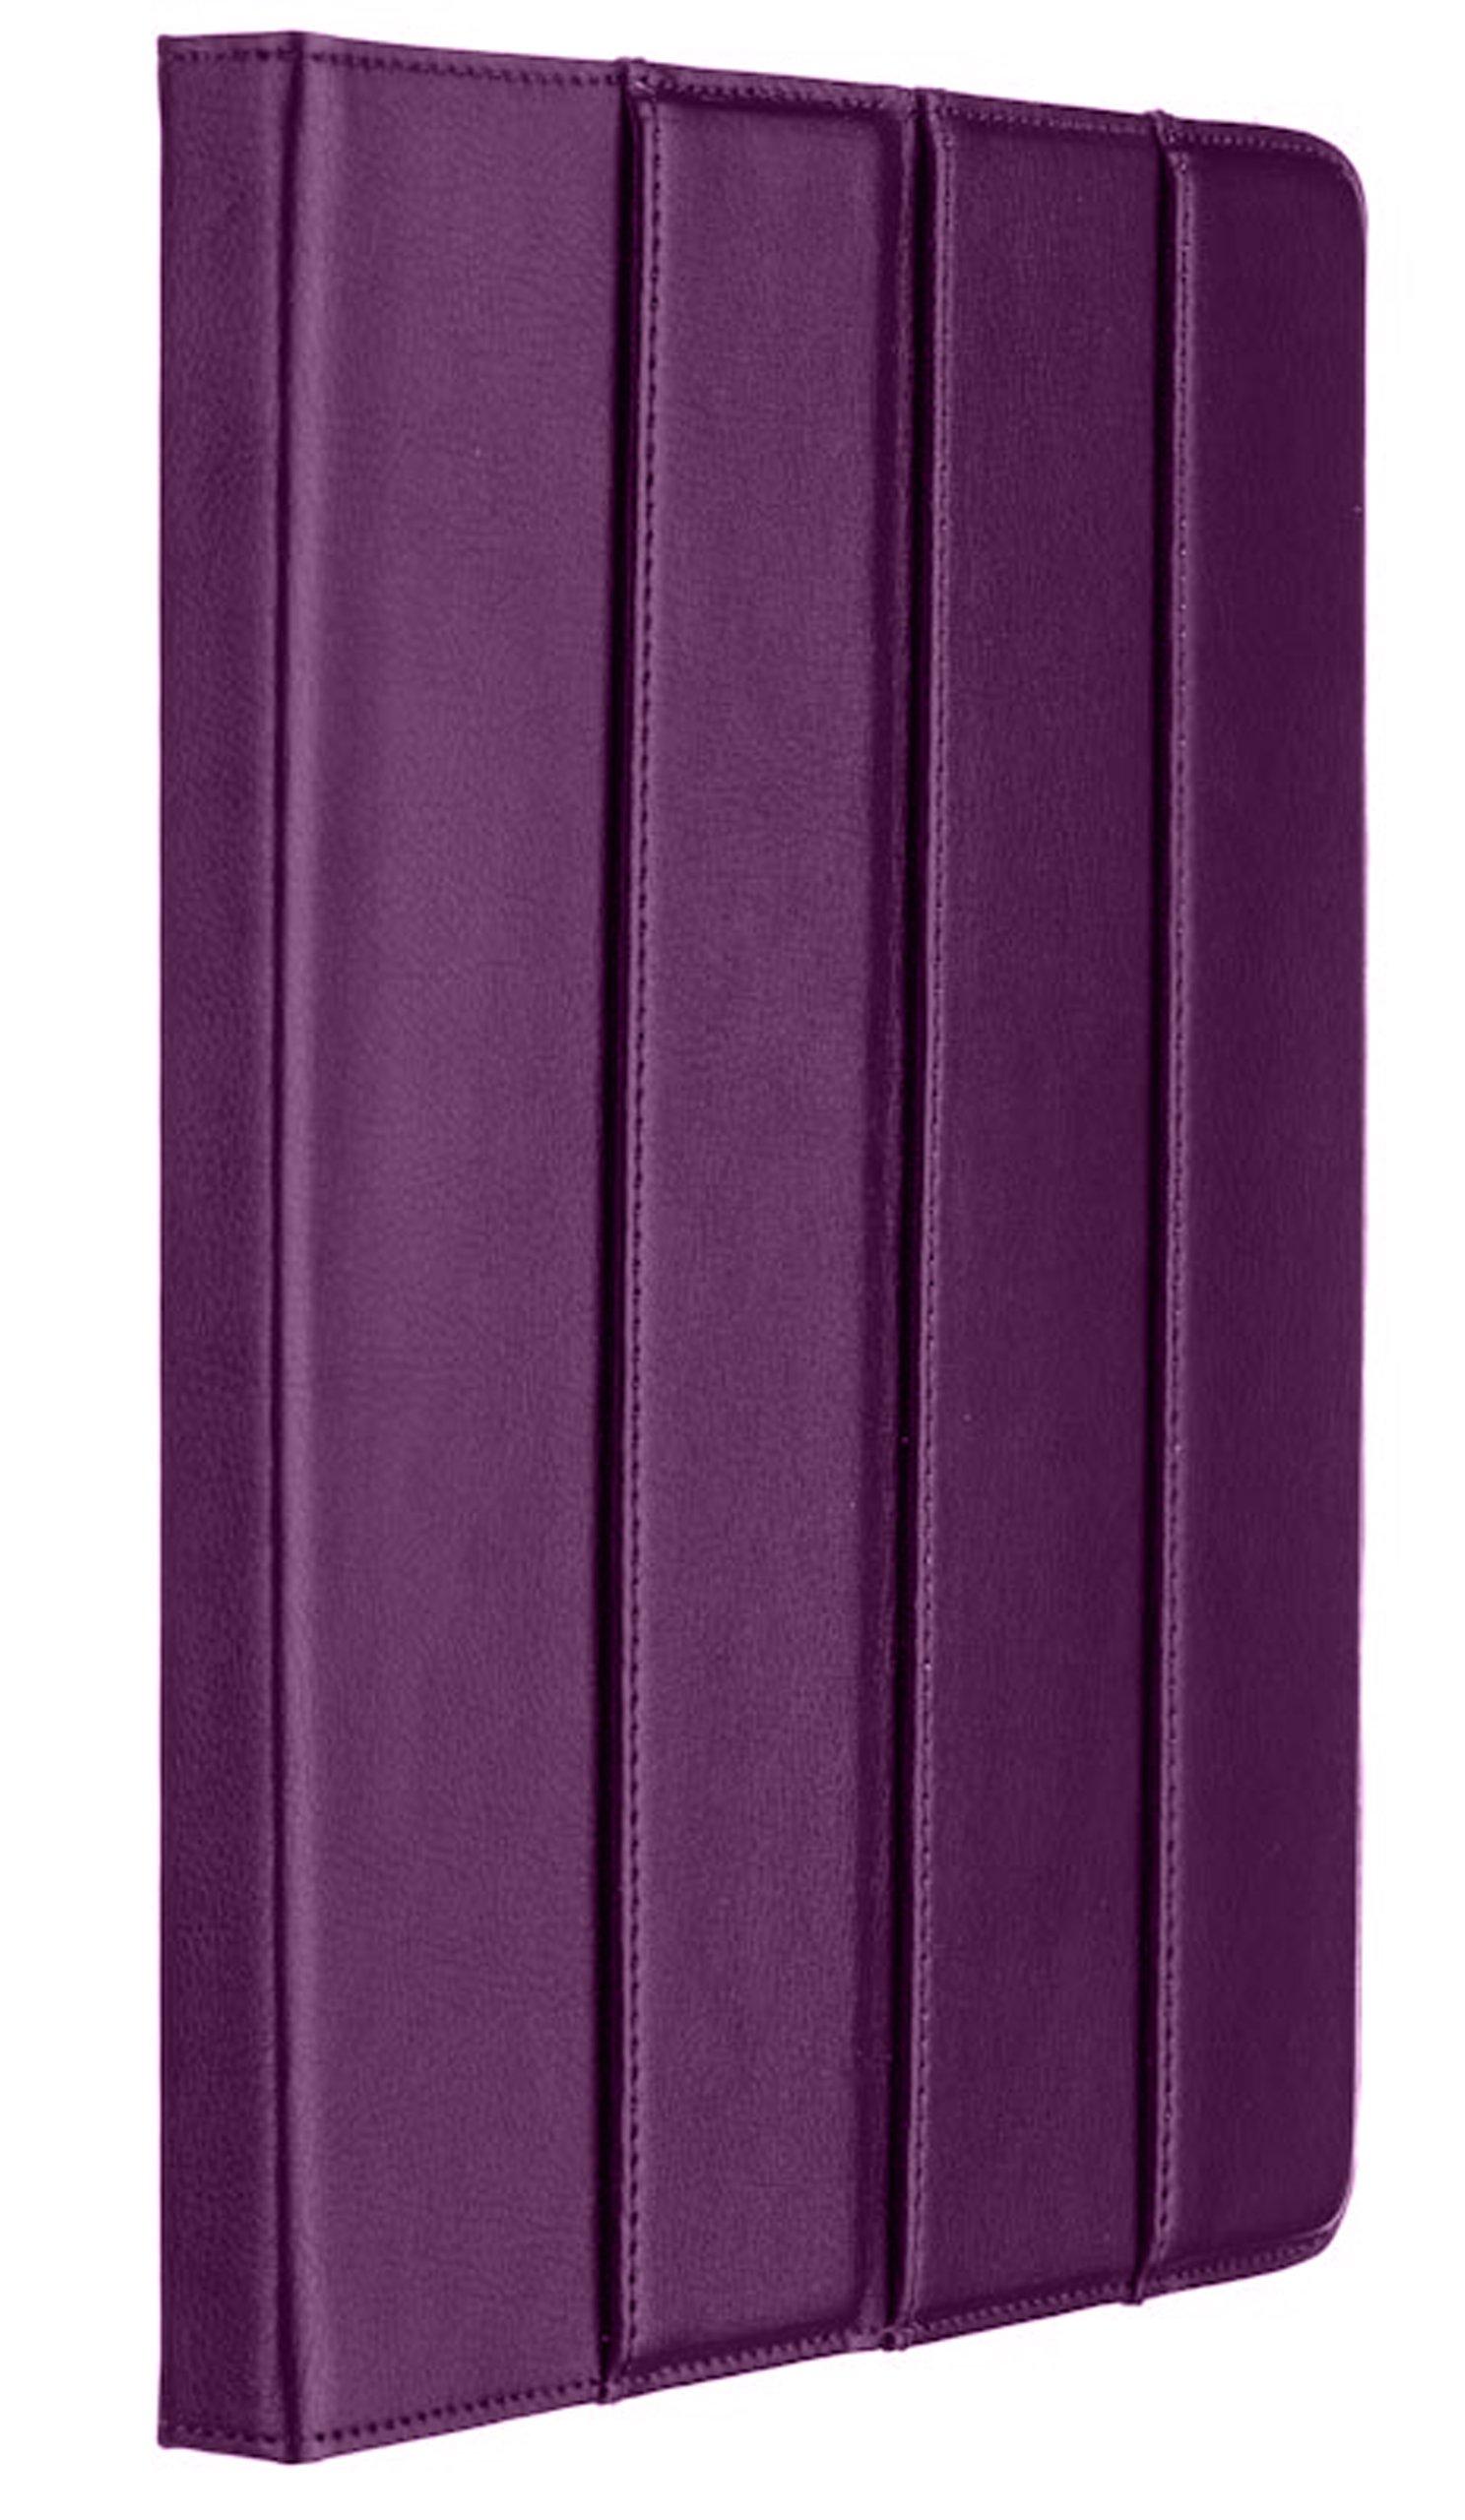 M-Edge Incline Purple Jacket with Mul iPad 2 Cases